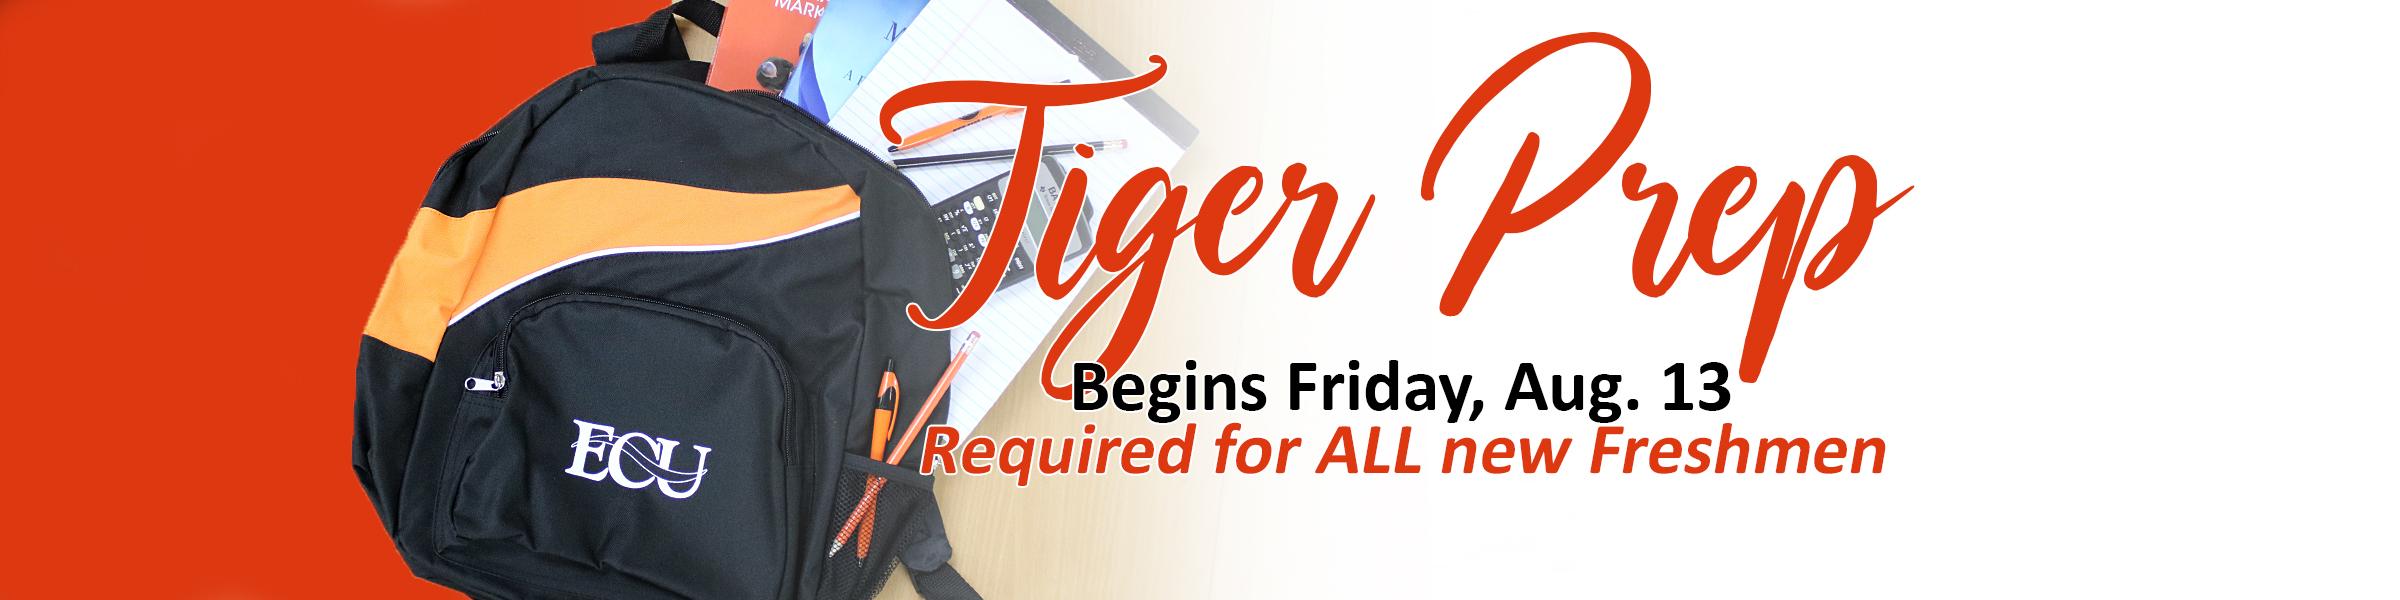 Tiger Prep slider